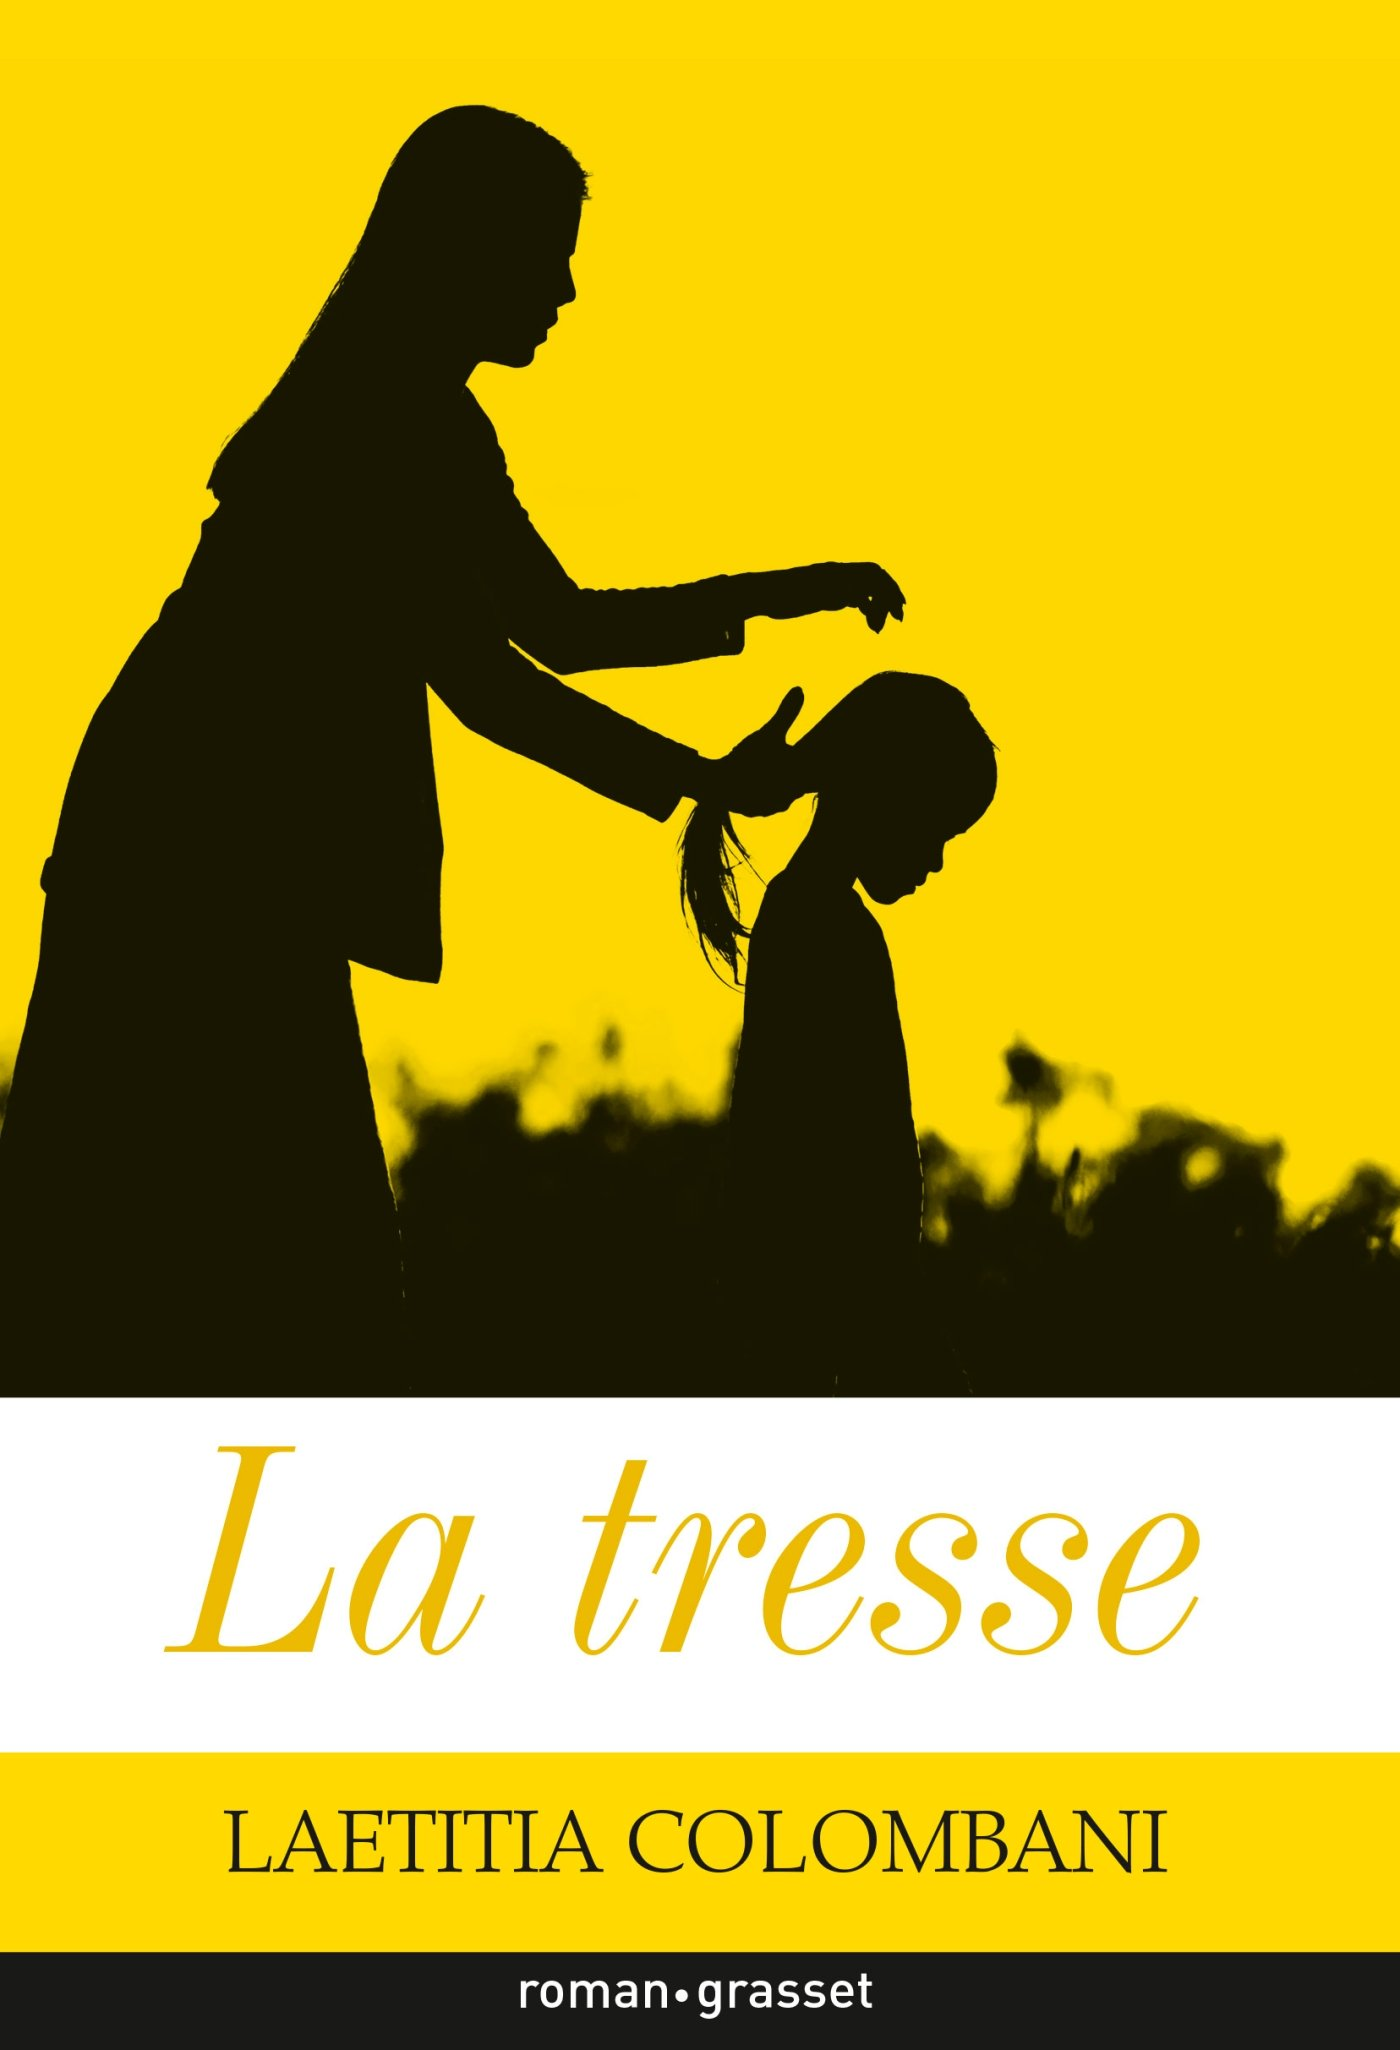 Ernest-mag - Latresse